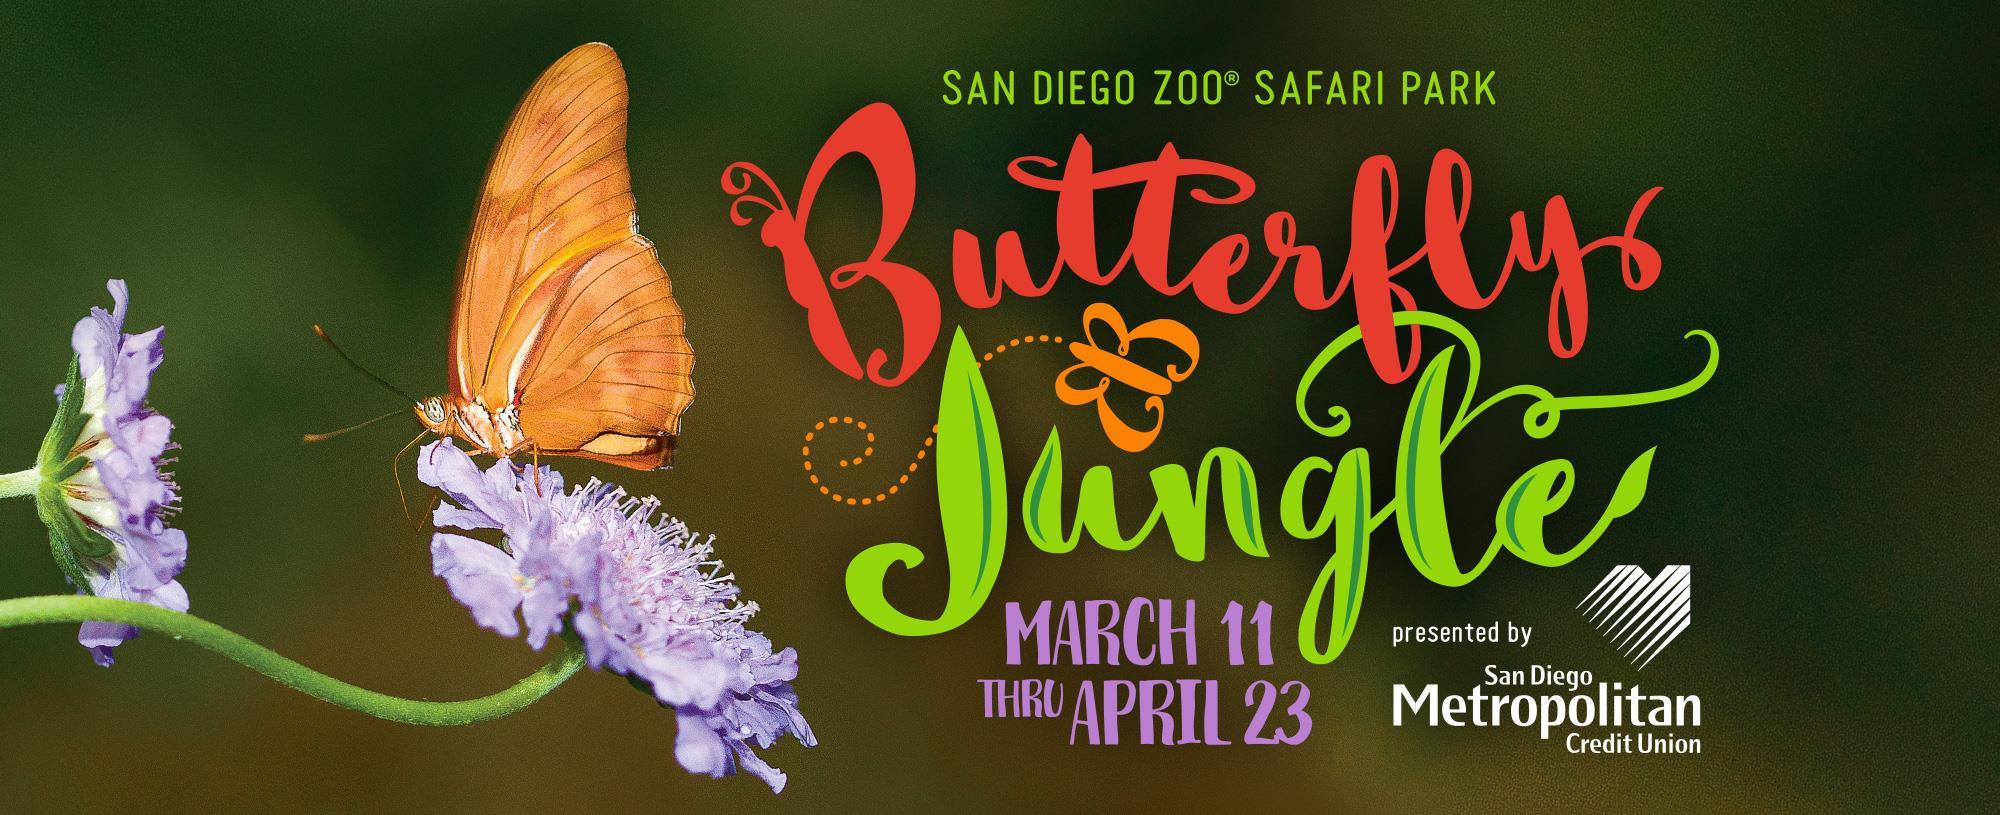 Butterfly Jungle - San Diego Zoo Safari Park